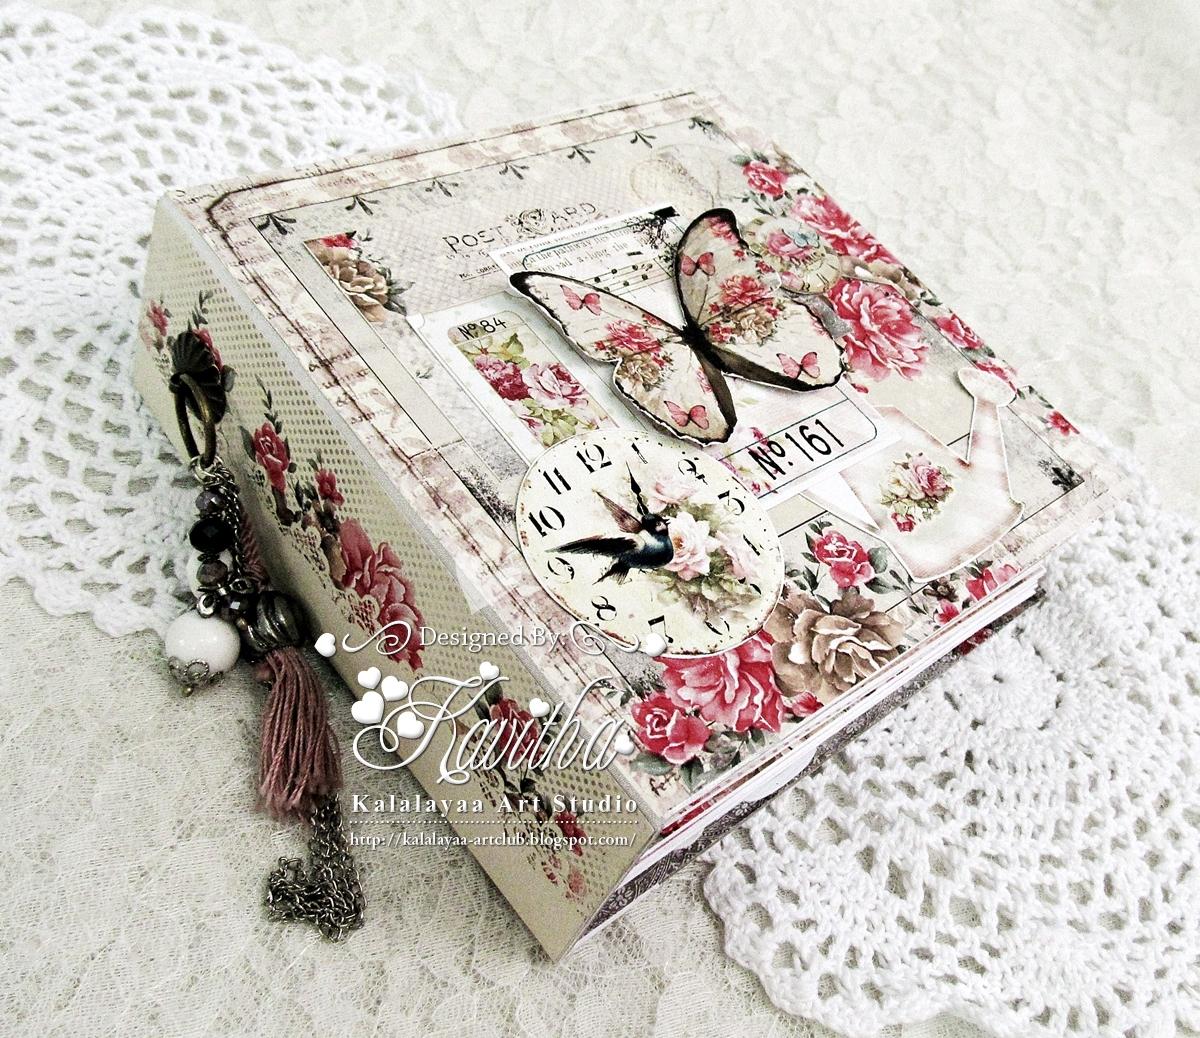 kalalayaa s art stuido romantic shabby chic mini album rh kalalayaa artclub blogspot com  shabby chic baby photo album